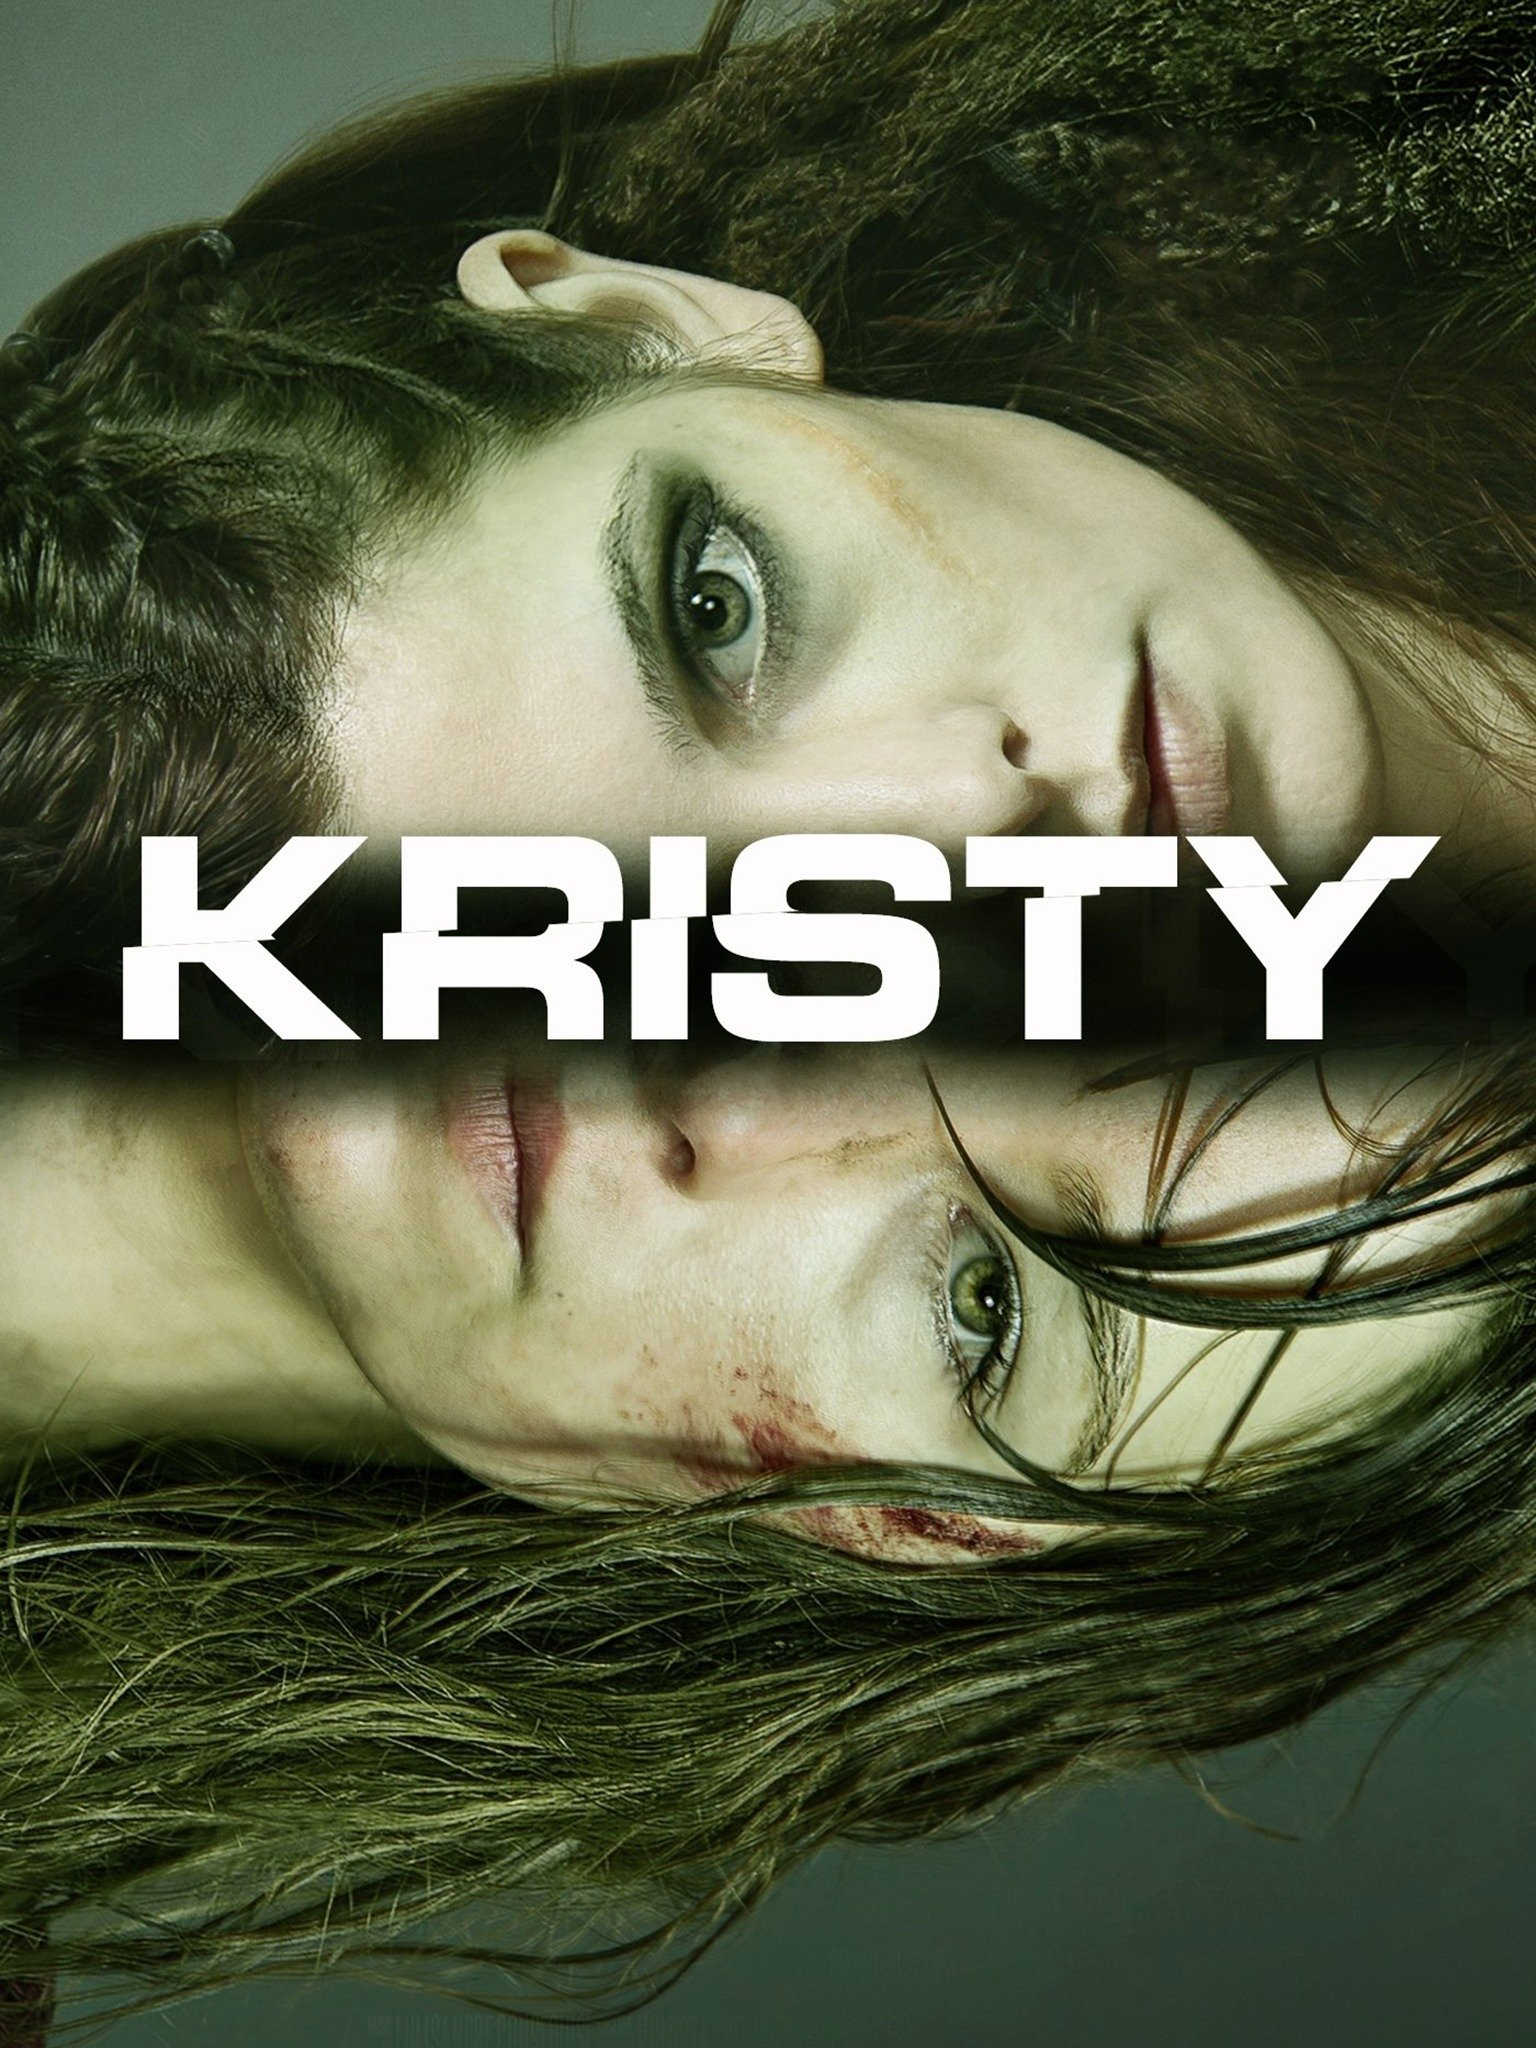 Kristy 2014 Rotten Tomatoes